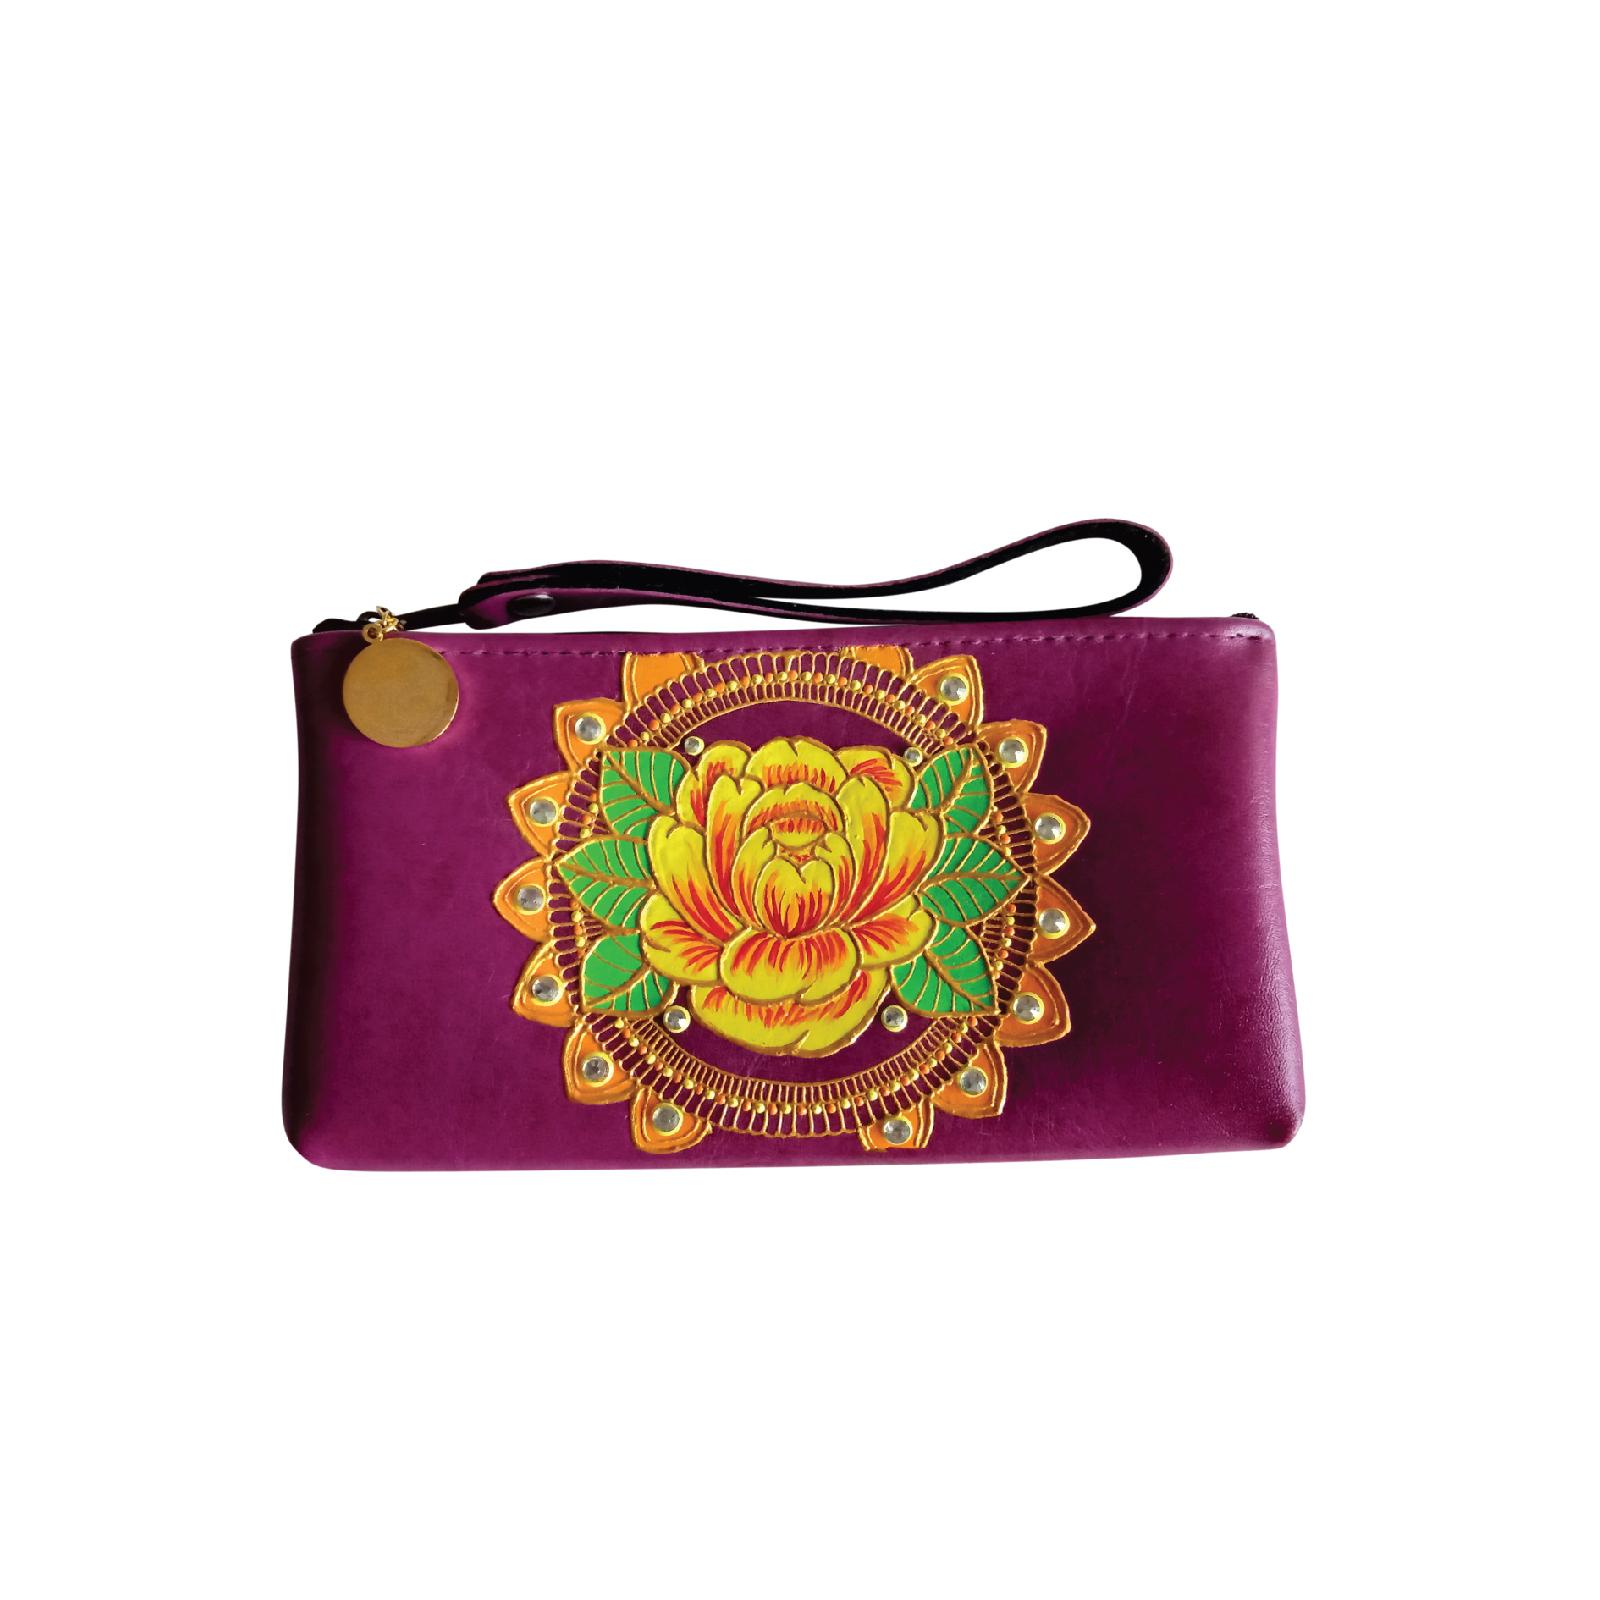 Item 2 - Peranakan Peony Collection-Hand-painted Wristlet (Purple_S).jpg